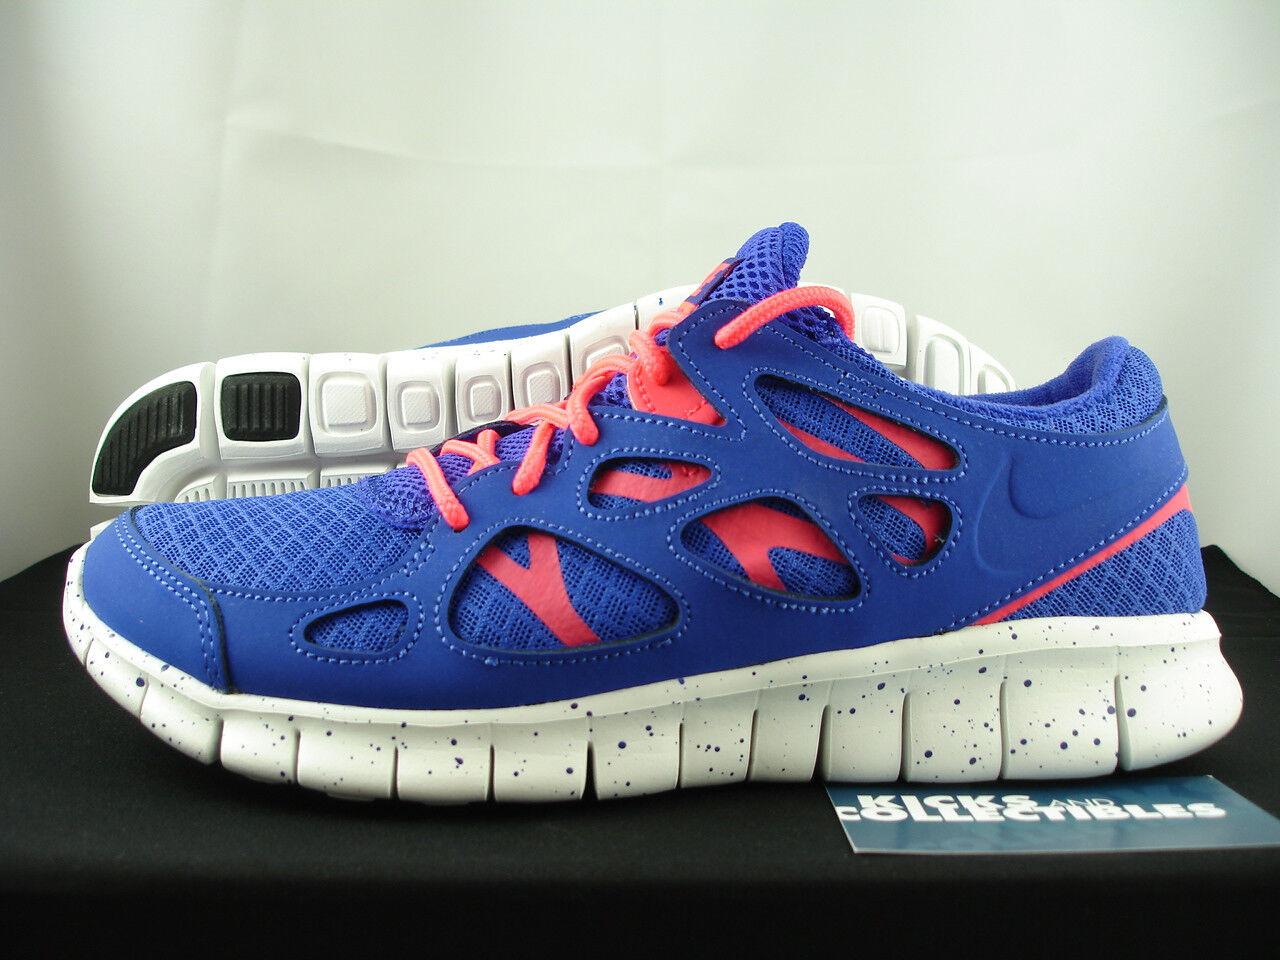 Nike libero max 2 ext 8 555174 446 trainer 360 max libero lunar aria huarache 62e7c4